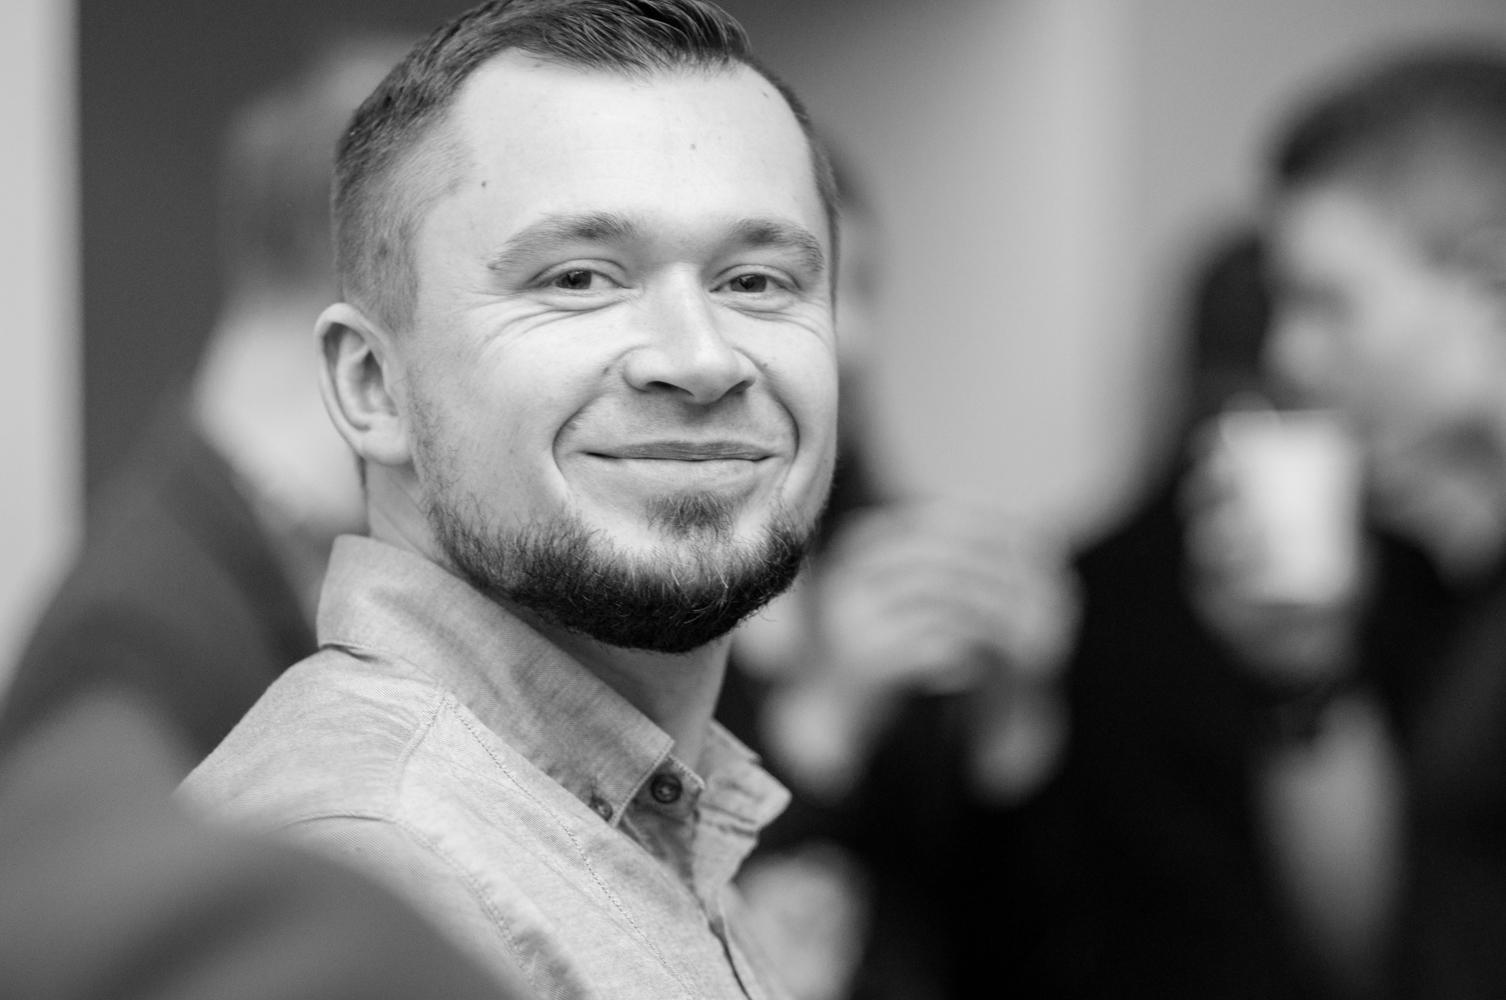 Zdj_Kolobrzeg_3_24